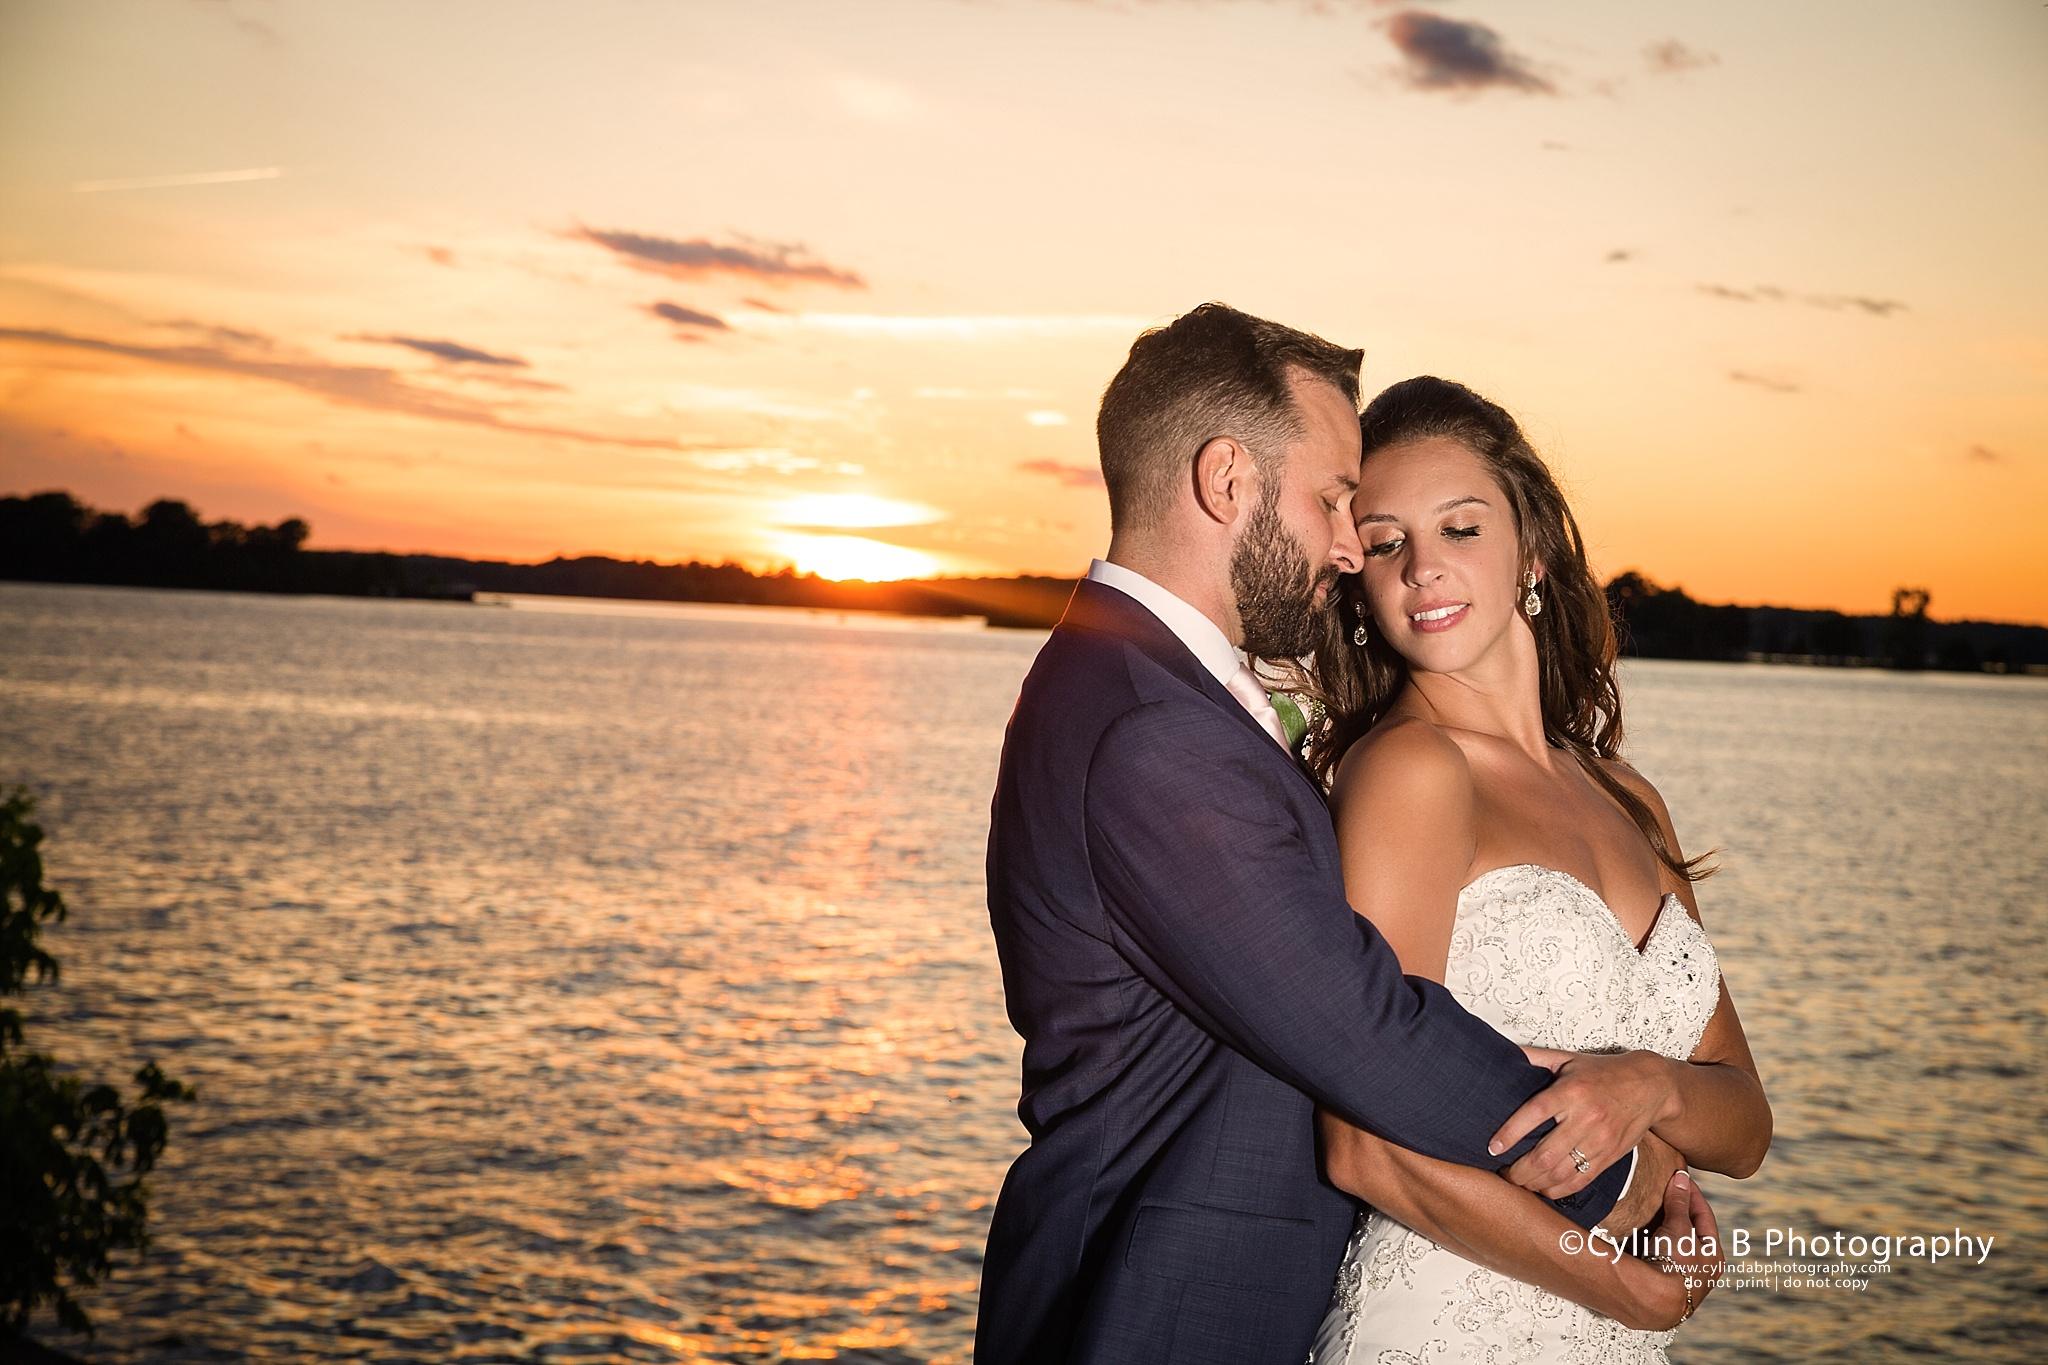 Boldt Castle Wedding, Alexandria Bay, Wedding, Photograper, Cylinda B Photography-39